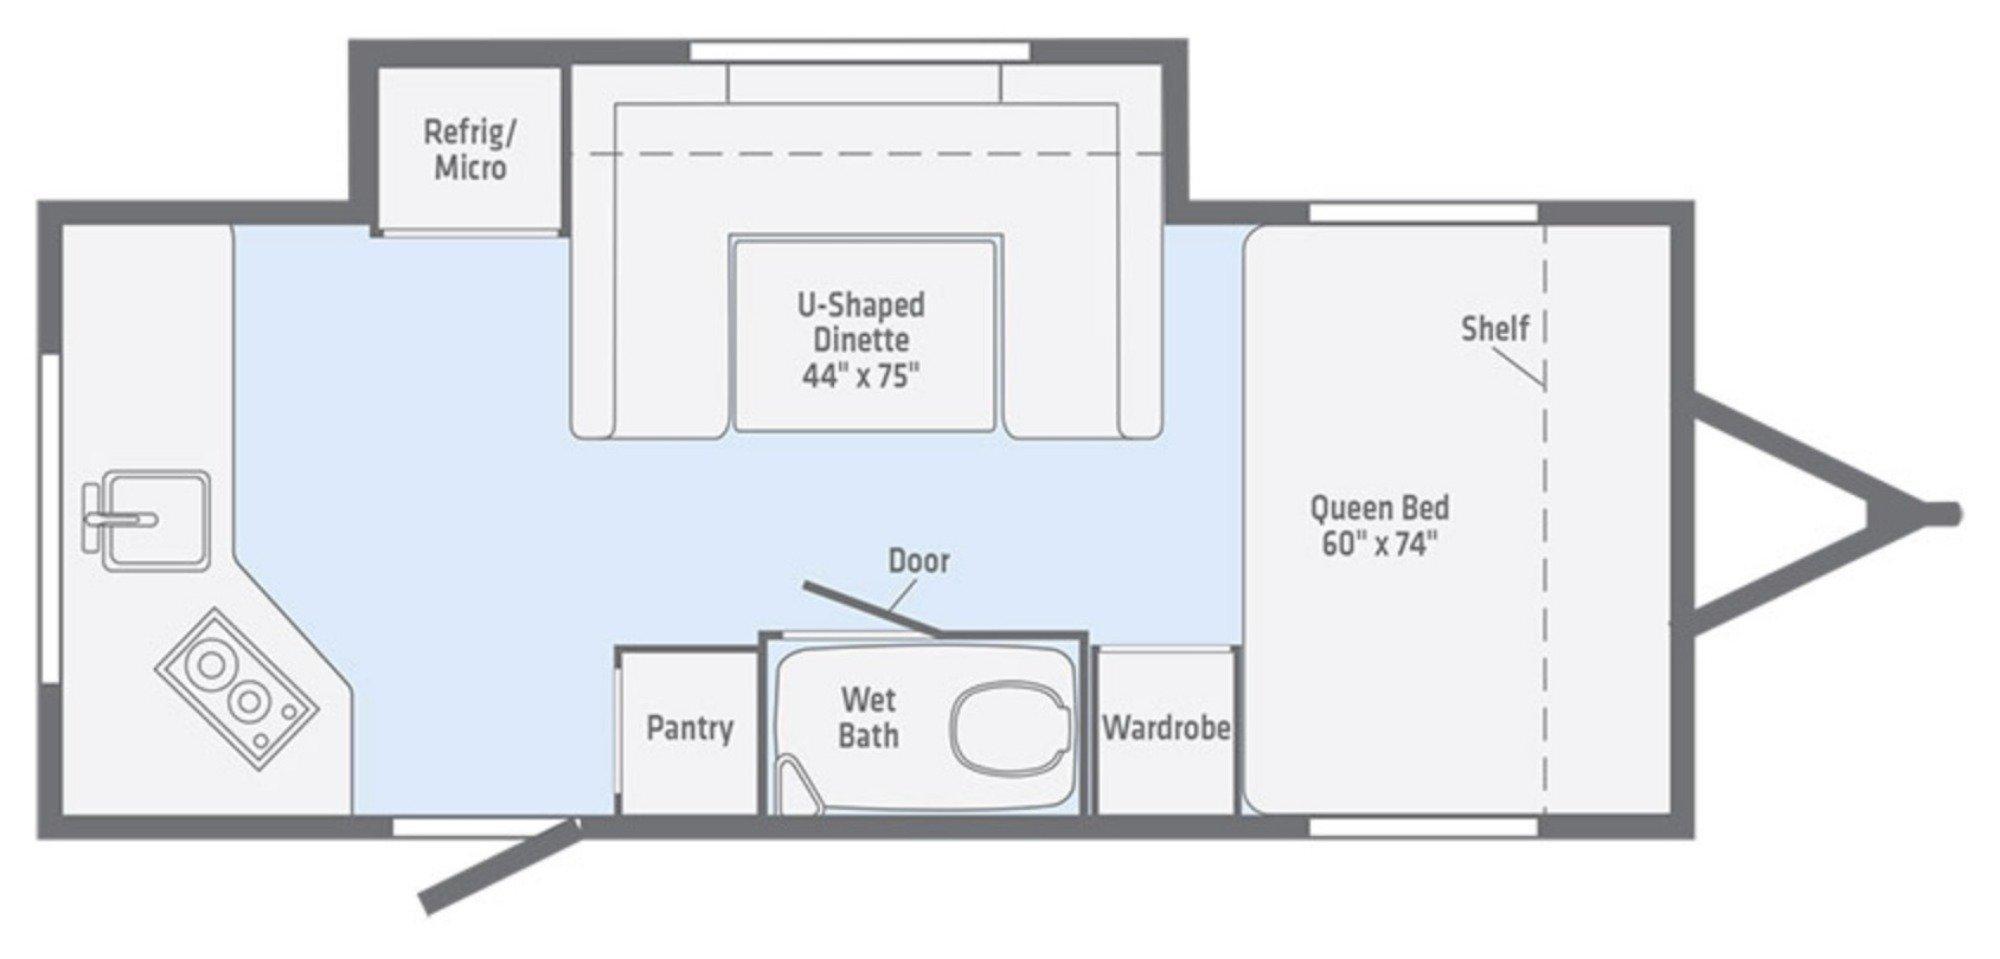 View Floor Plan for 2018 WINNEBAGO MINNIE DROP 1790